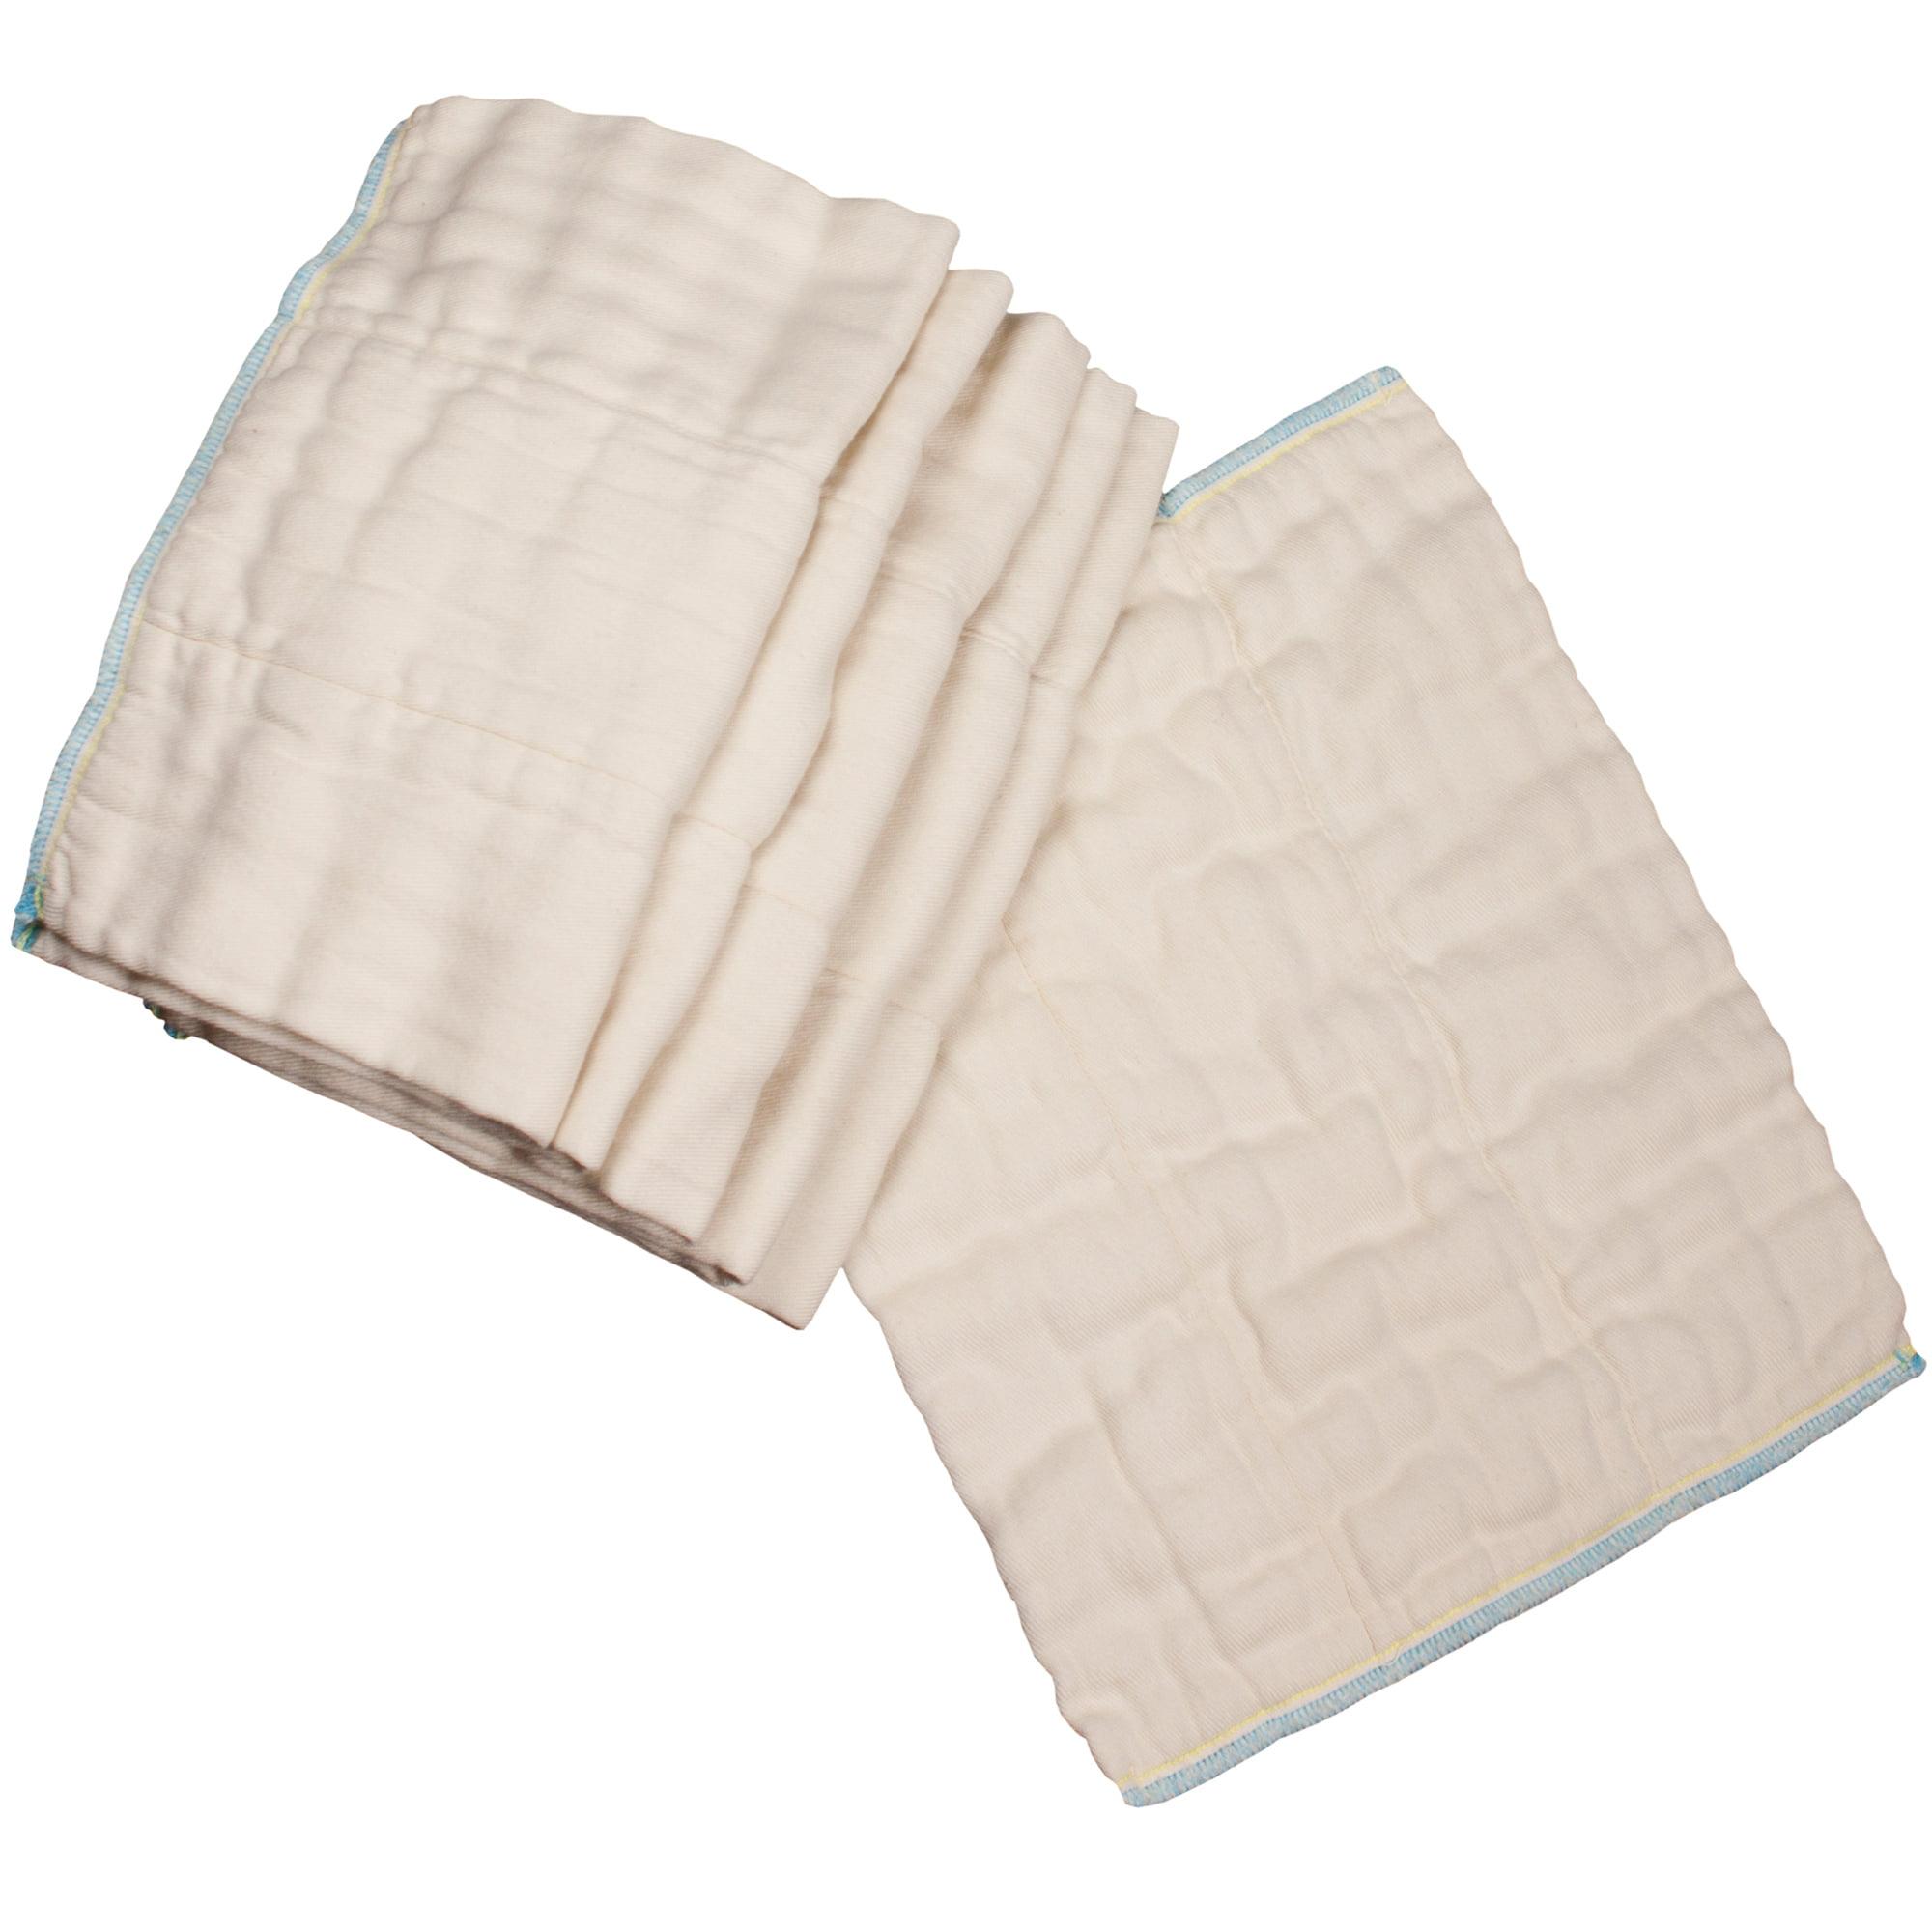 Osocozy Bamboo Organic Cotton Prefolds (6pk) - Infant 4x8x4